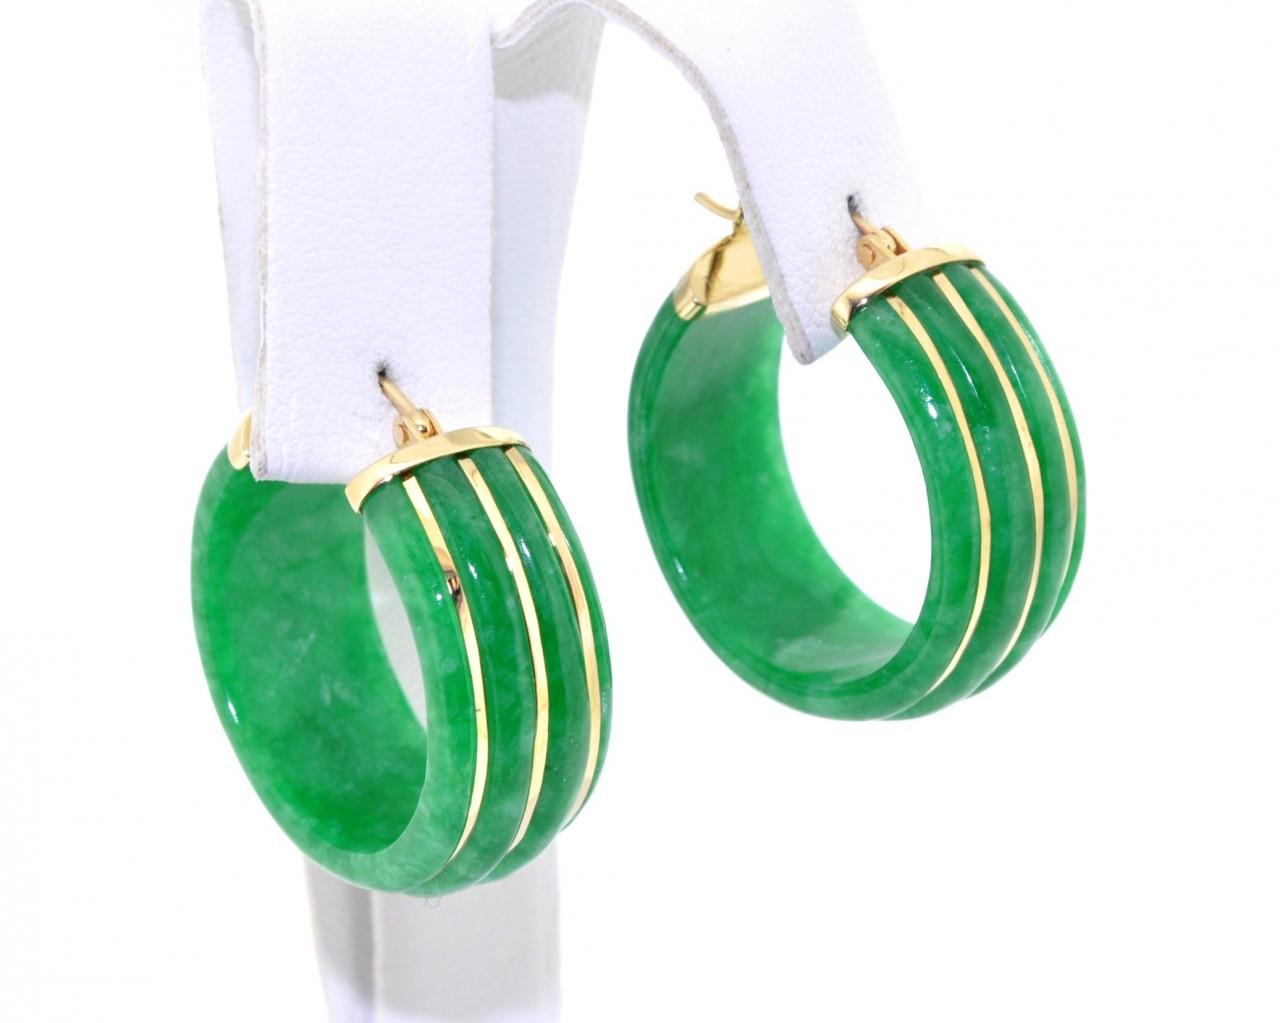 71c37b3e0 14K Yellow Gold Jade Hoop Earrings 42001588 - Shin Brothers Jewelers ...